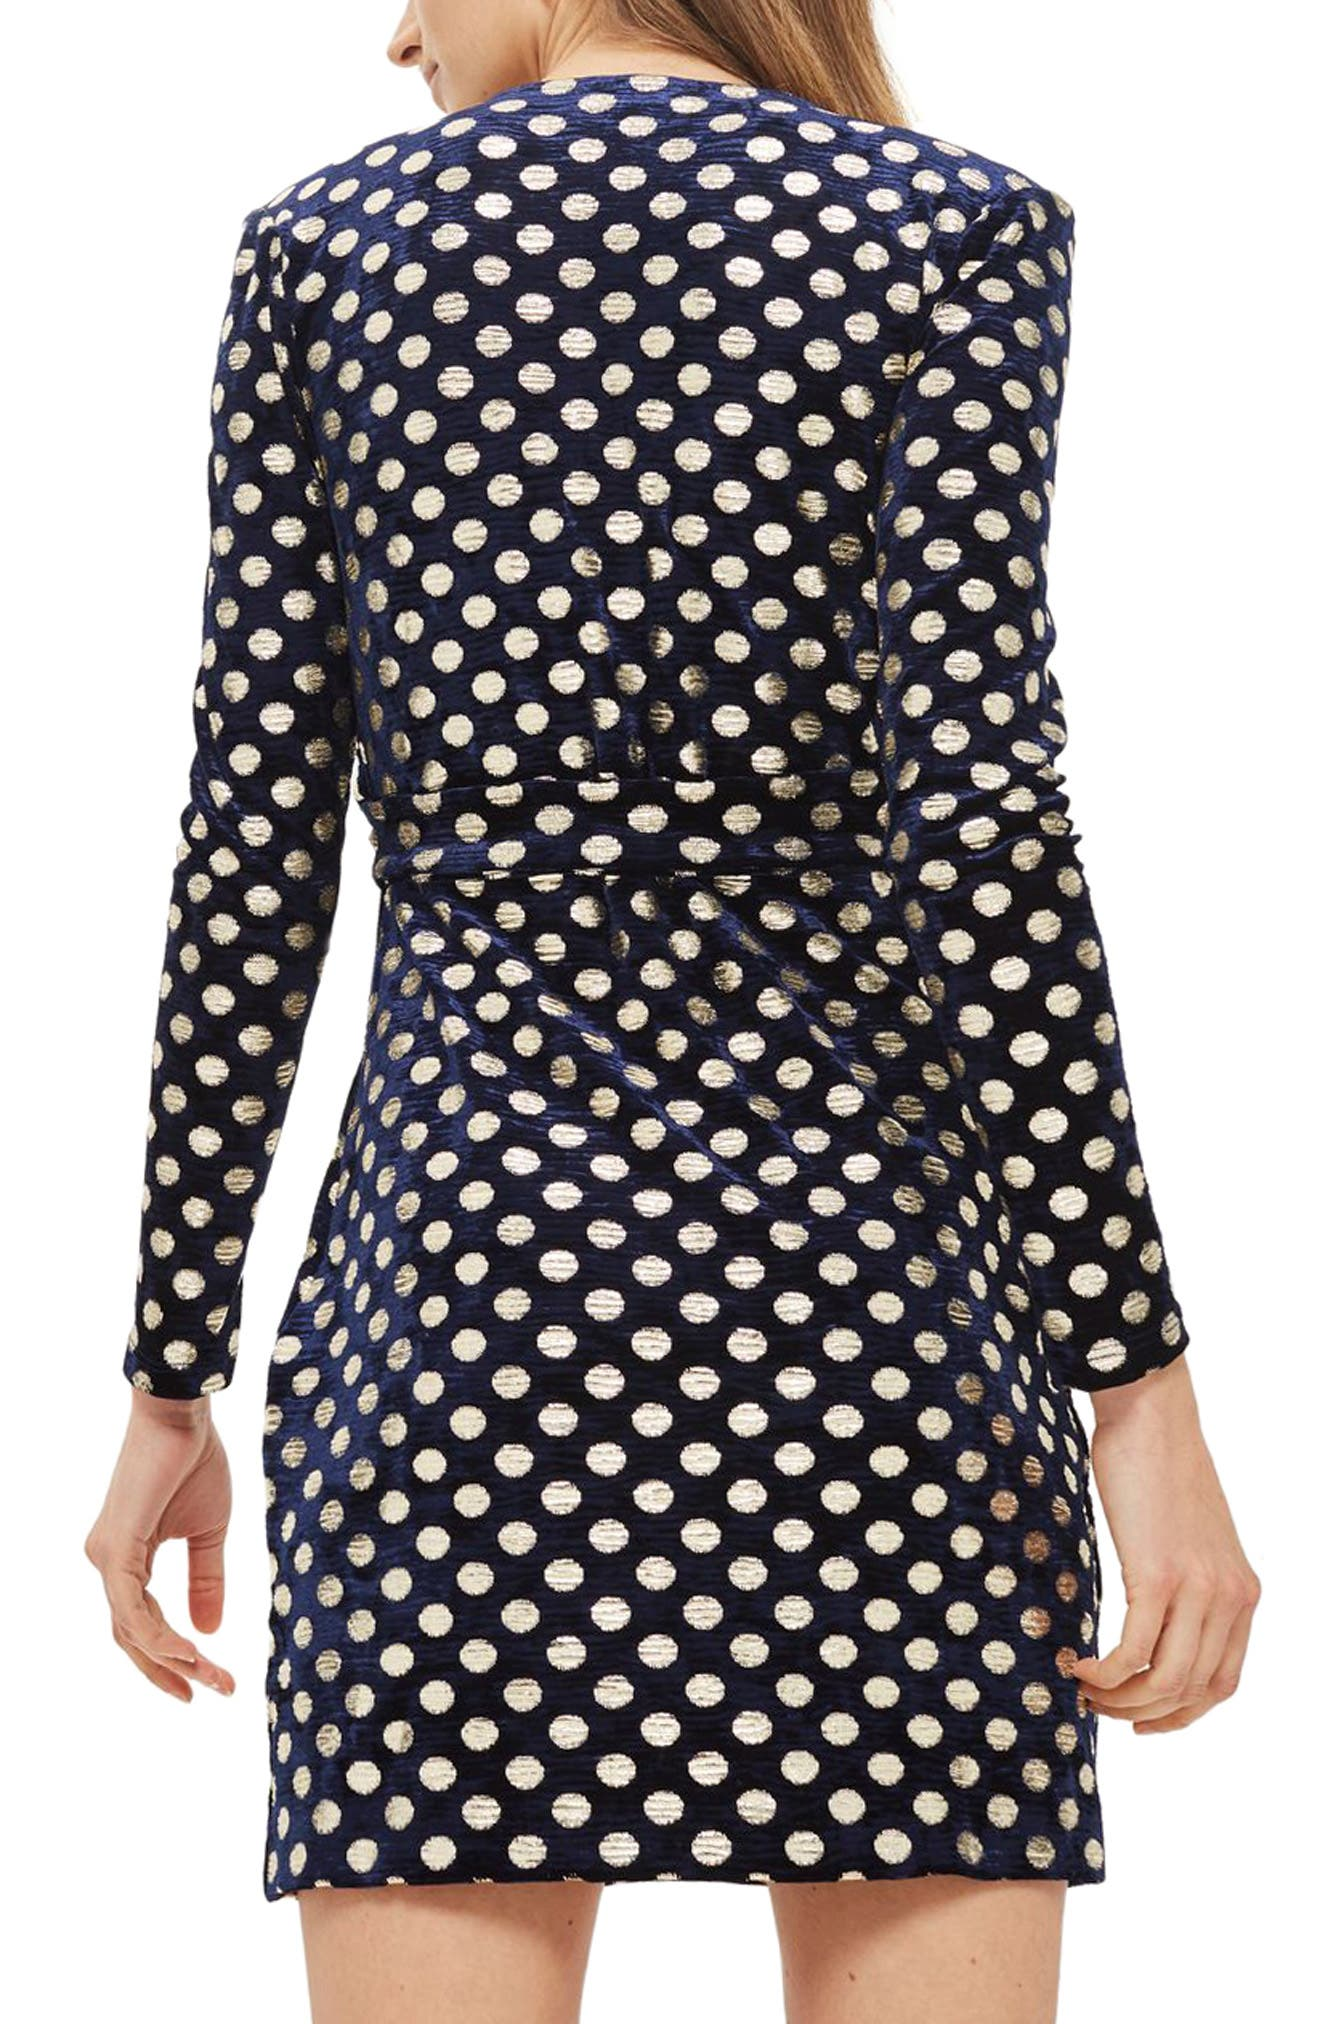 Foil Spot Wrap Dress,                             Alternate thumbnail 2, color,                             Navy Blue Multi